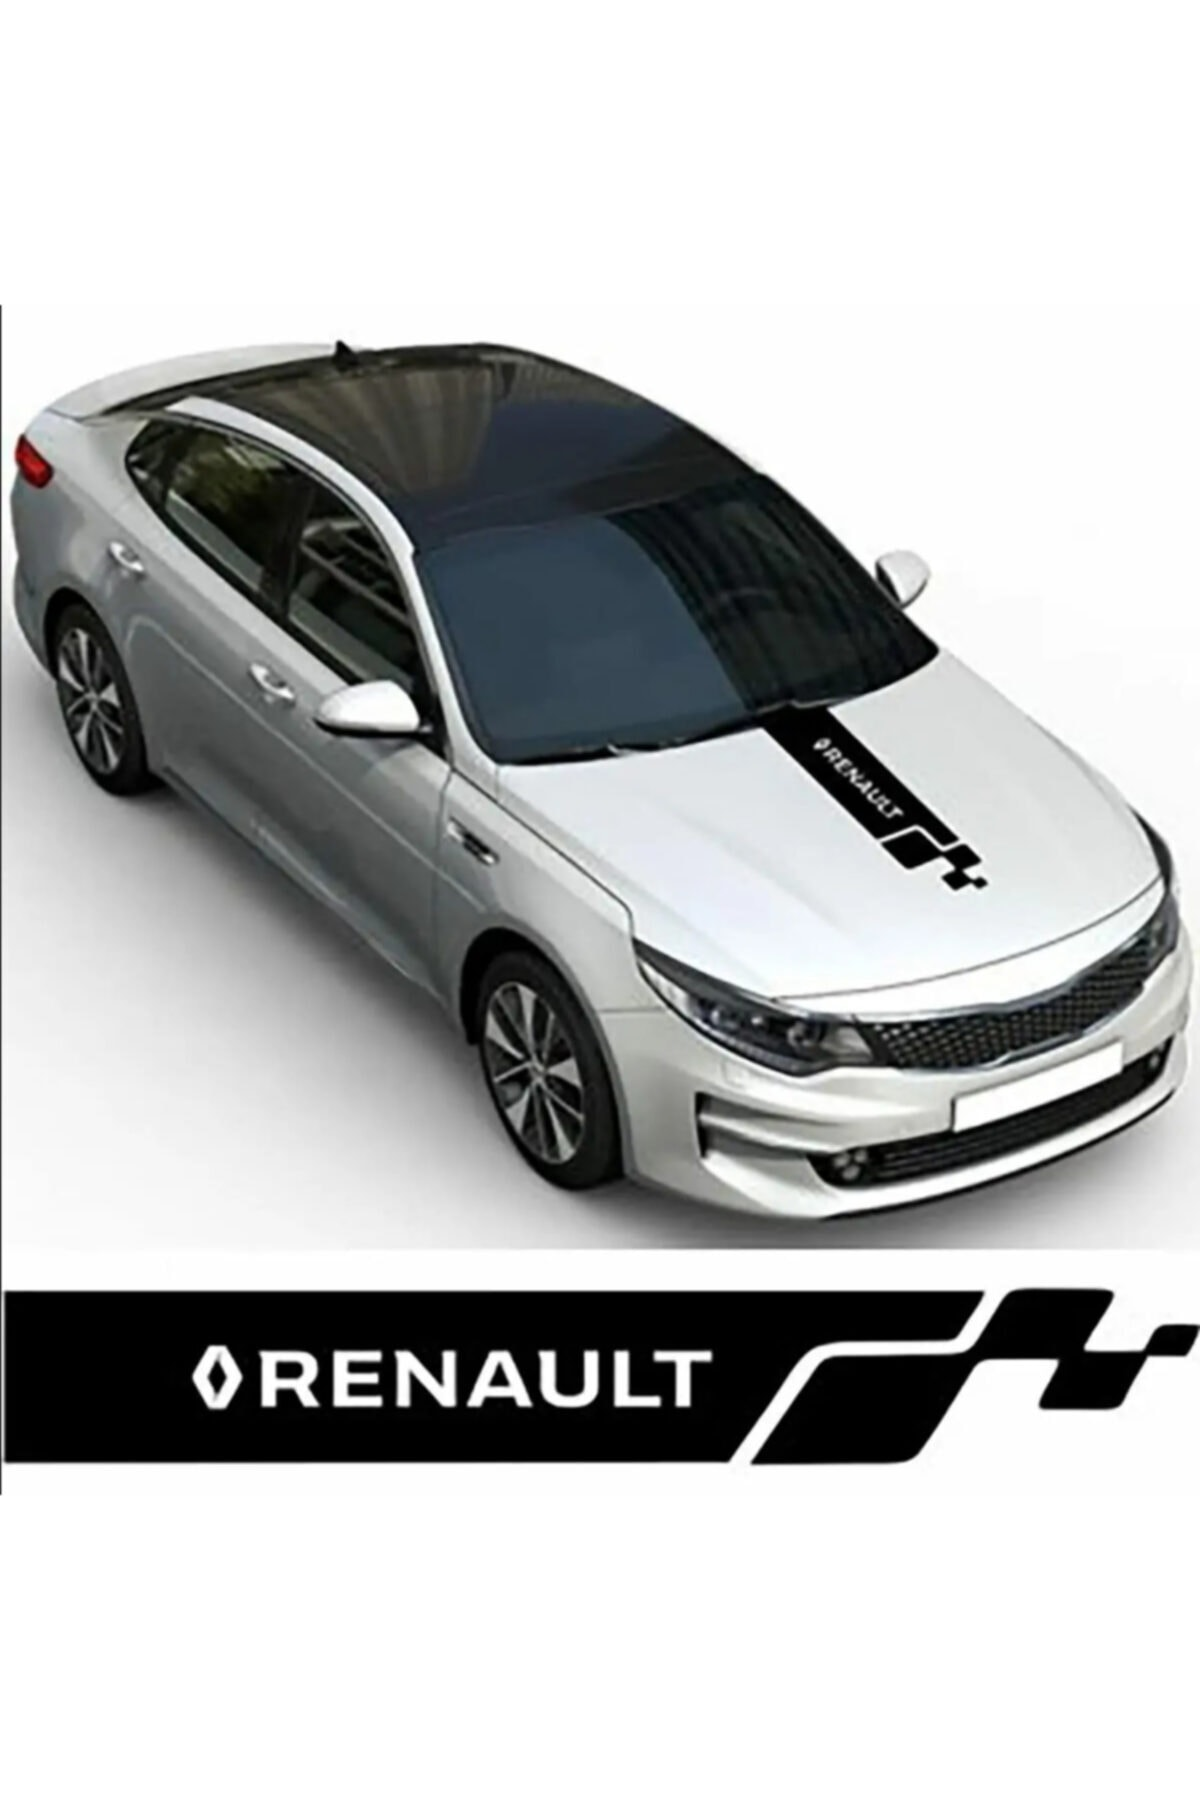 Ufaks Renault Kaput Oto Sticker Yapıştırma 1